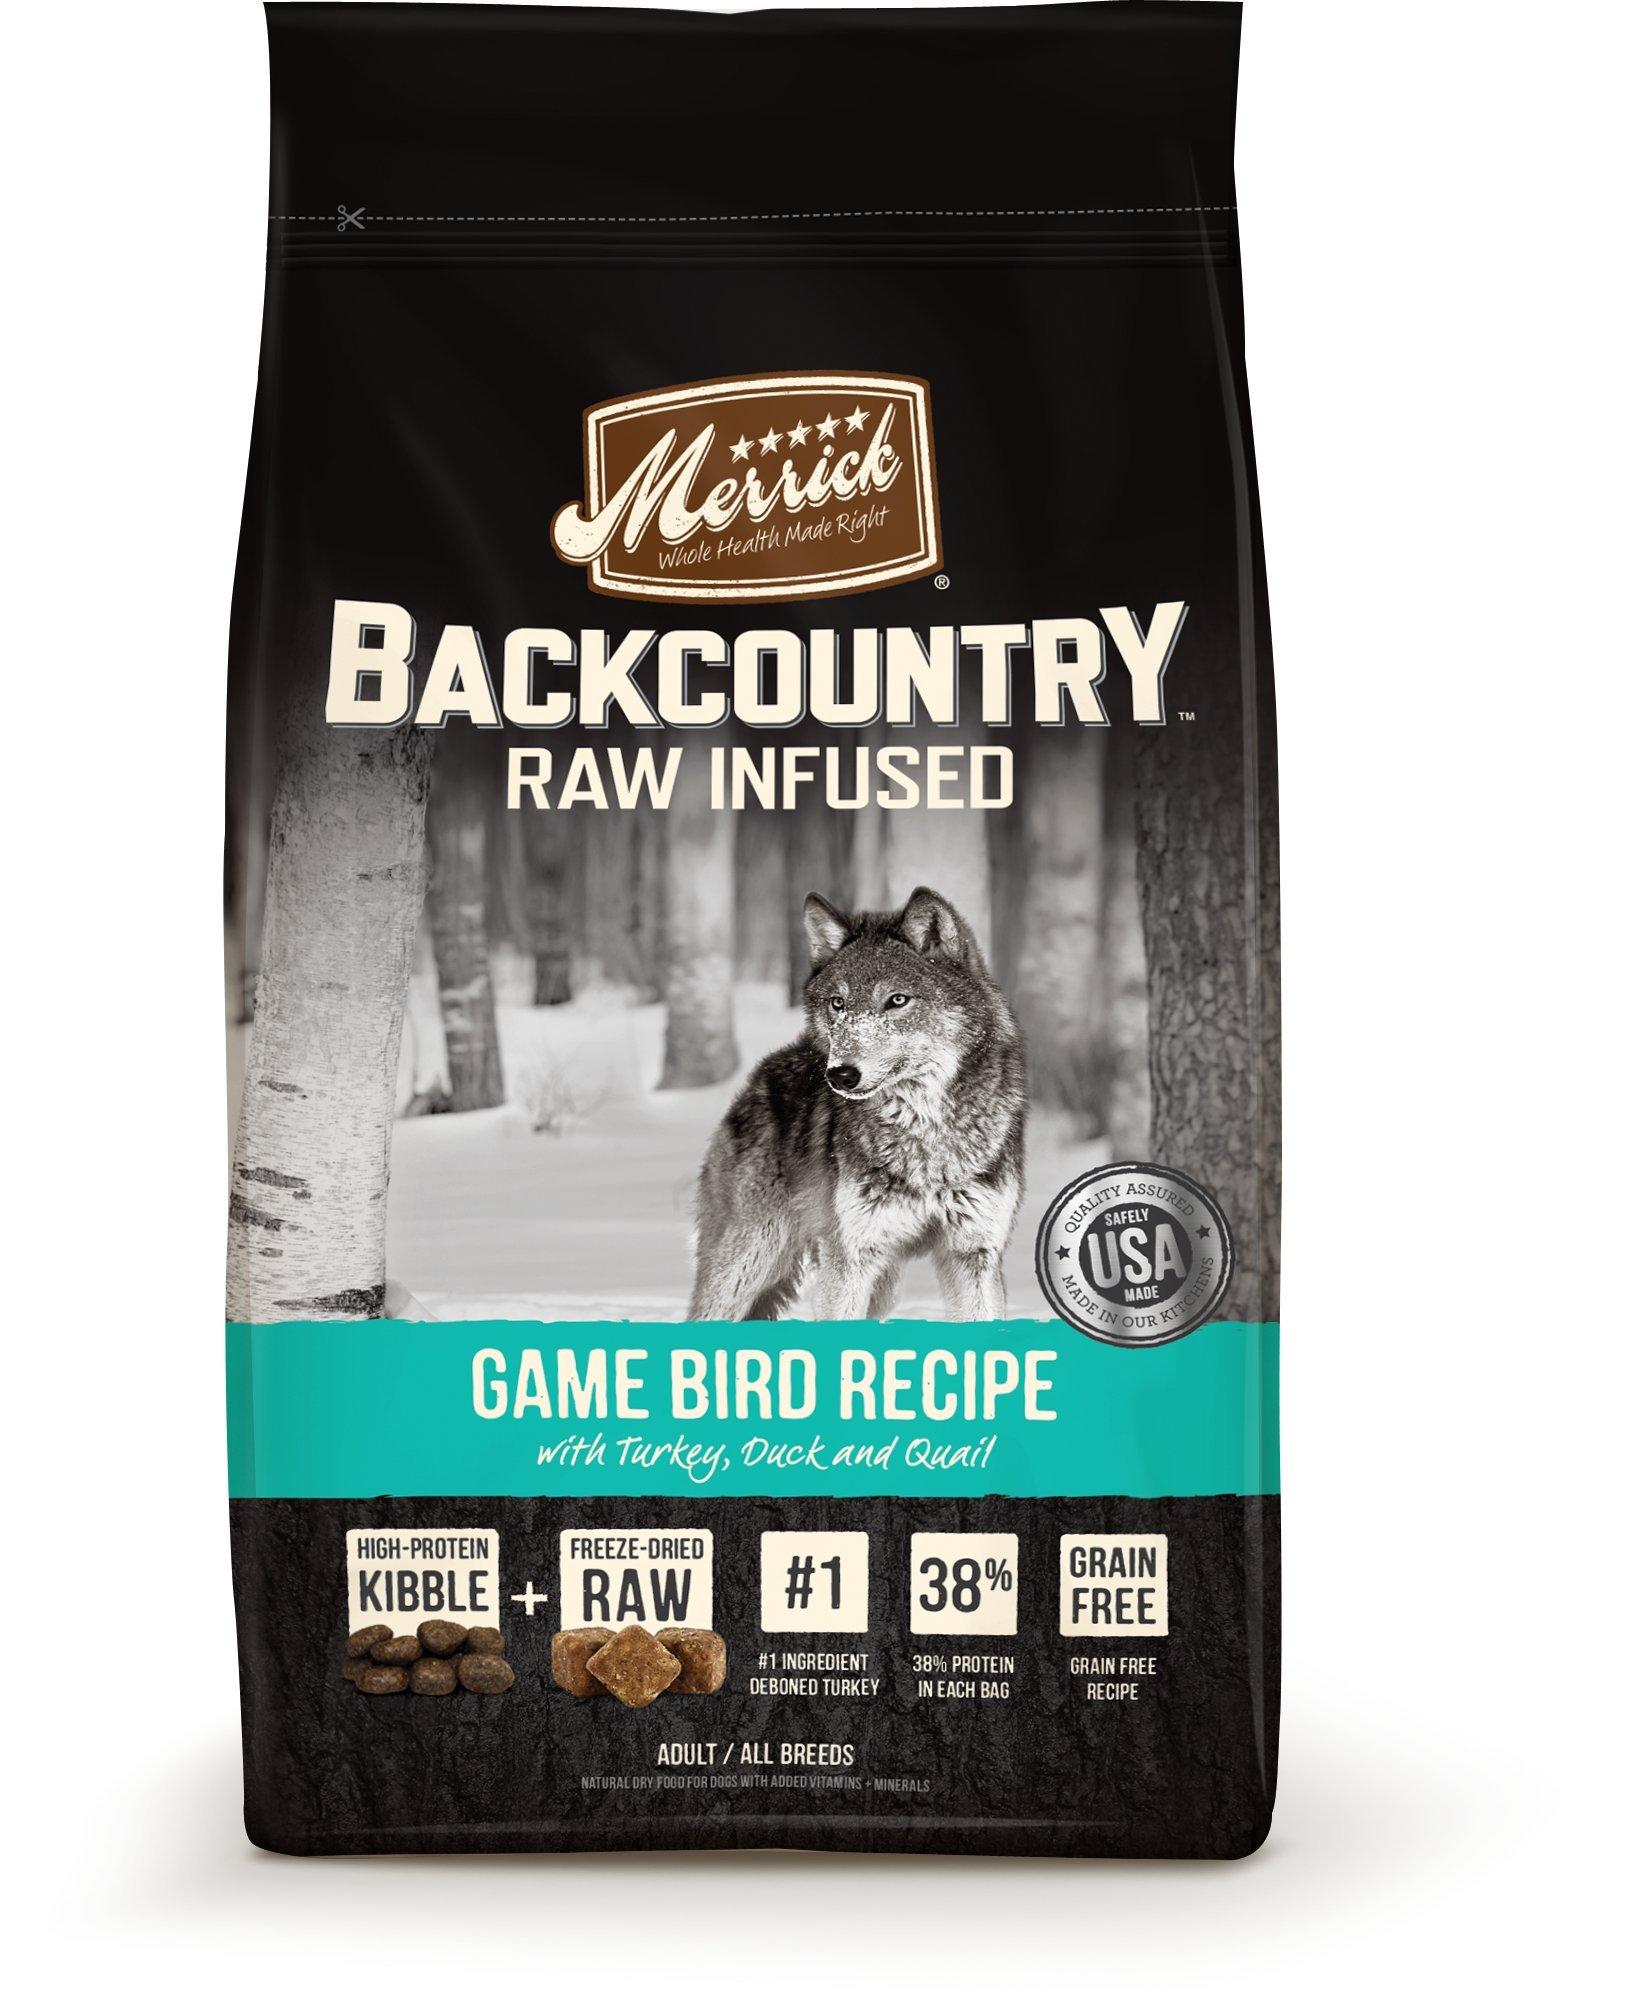 Merrick Backcountry Grain Free Raw Infused Game Bird Dry Dog Food, 22 lbs.